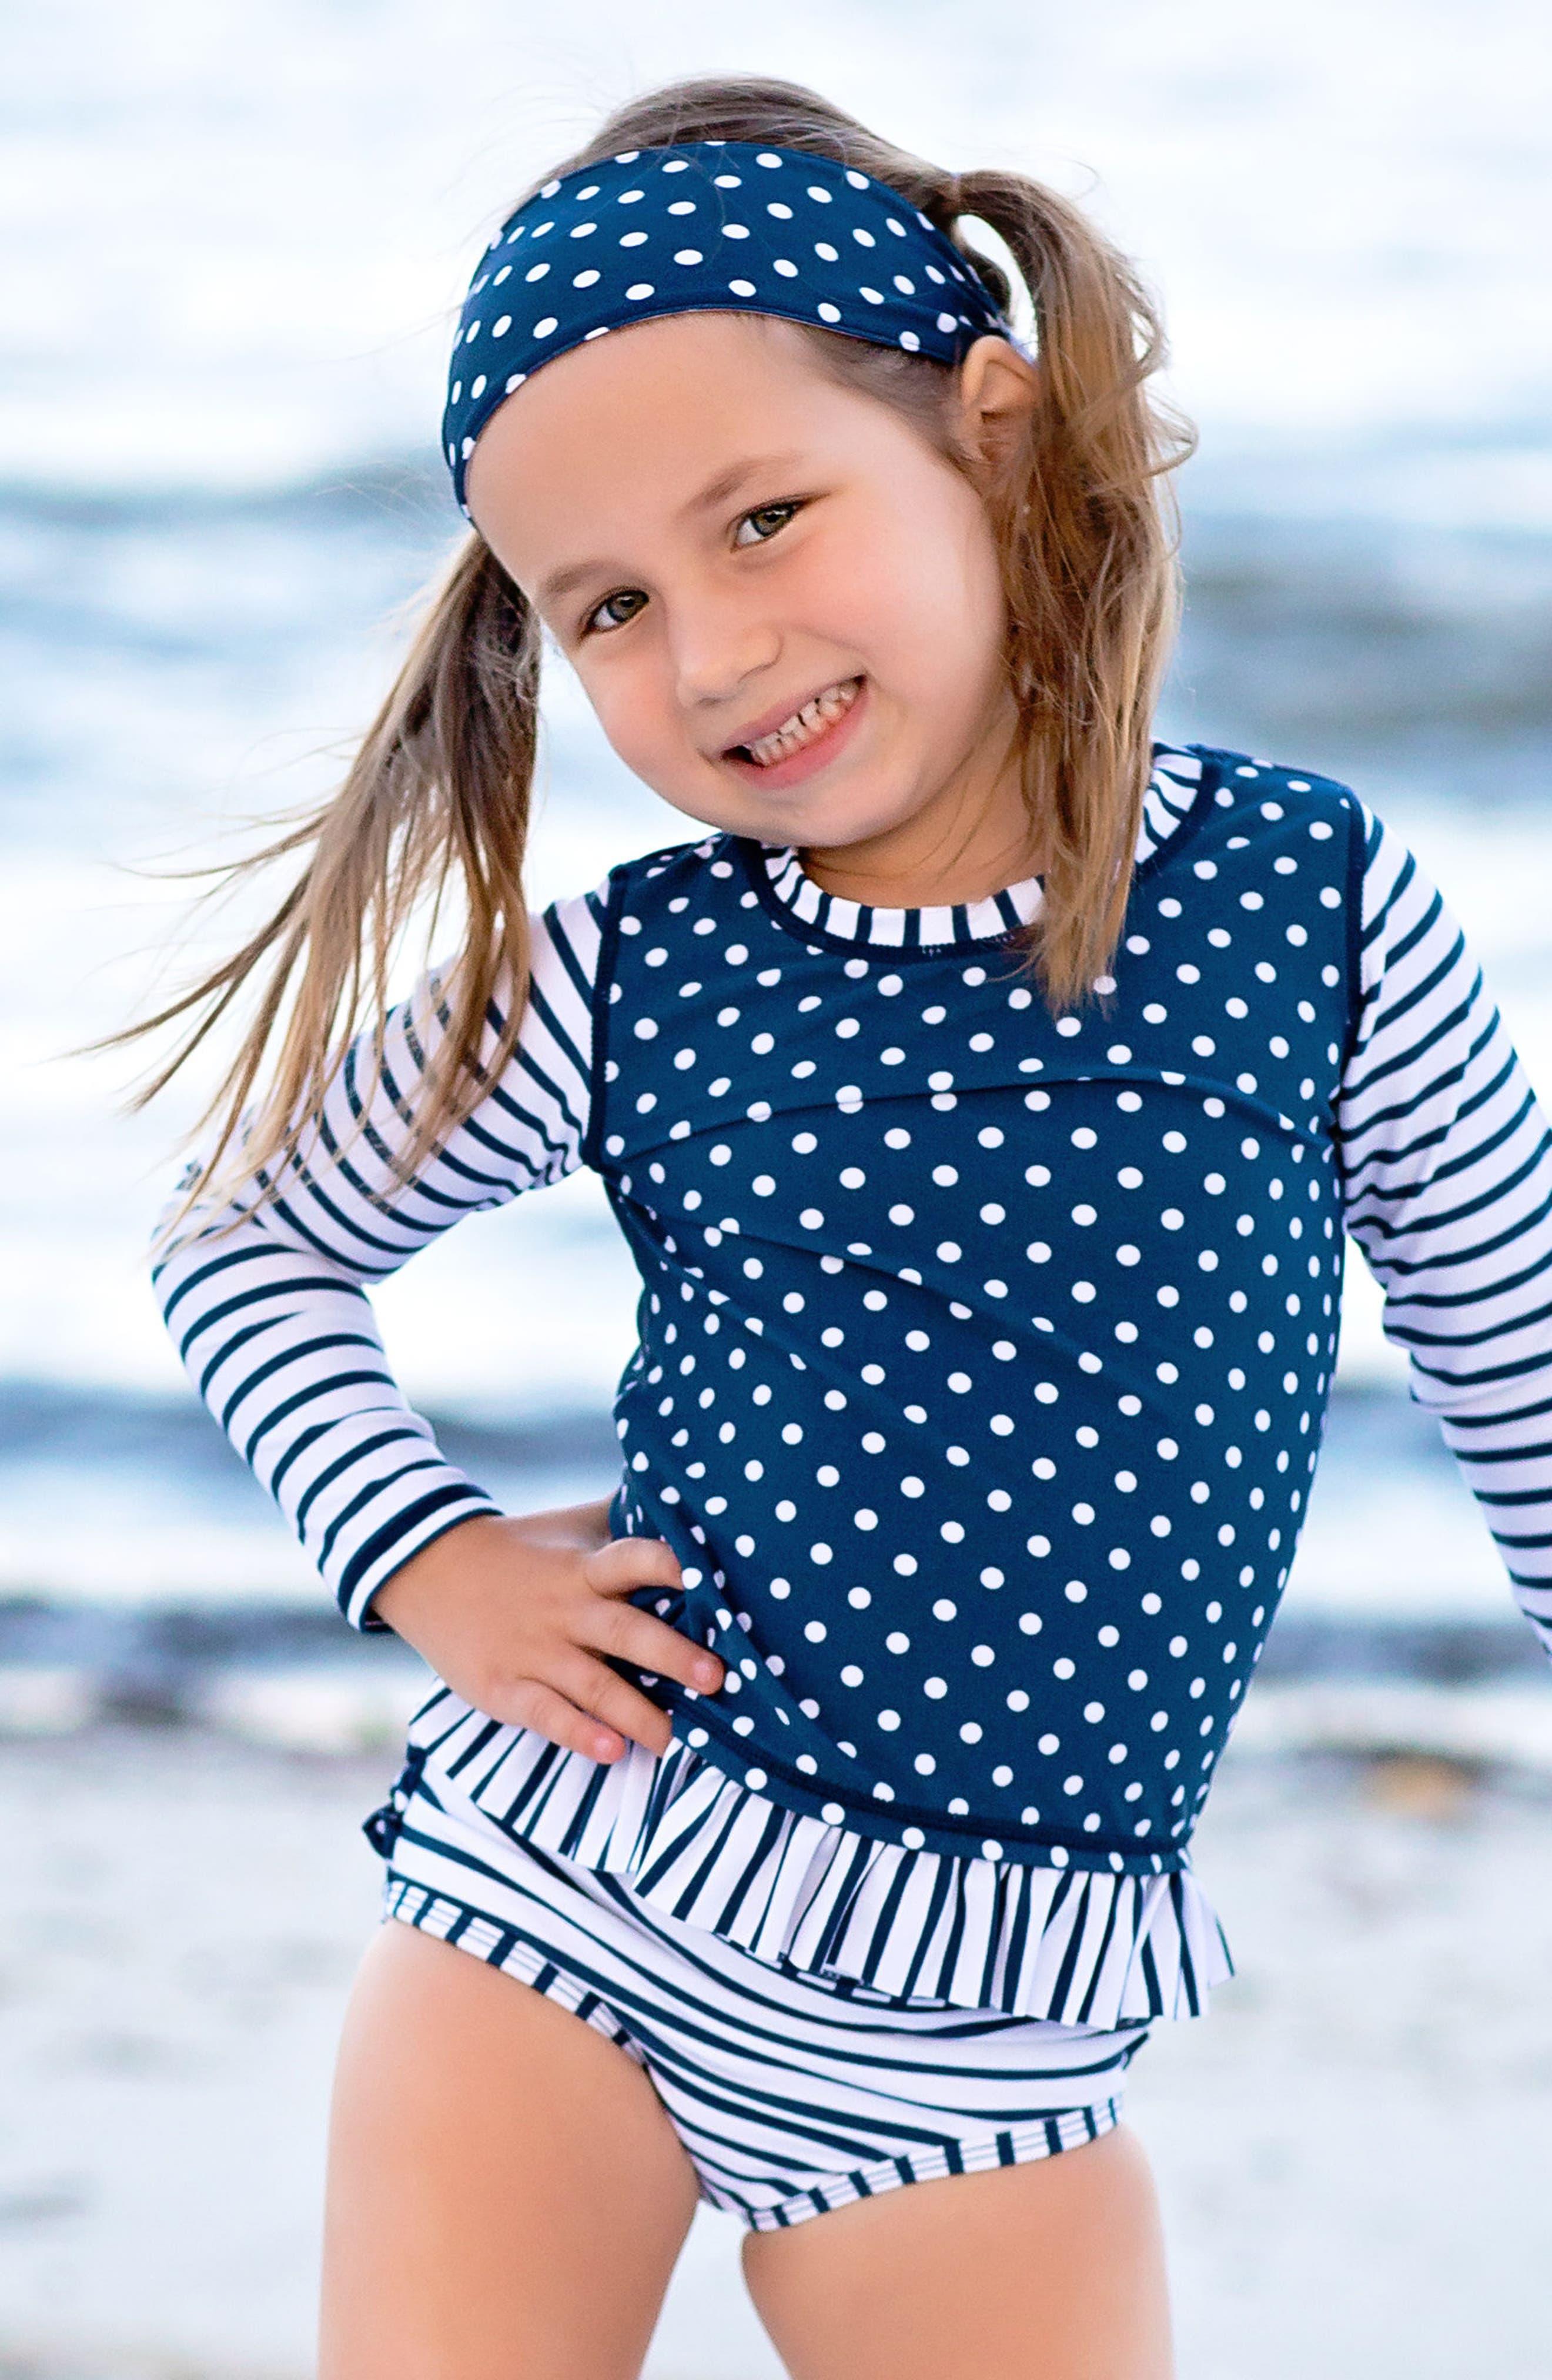 Alternate Image 3  - RuffleButts Two-Piece Rashguard Swimsuit & Headband Set (Toddler Girls)